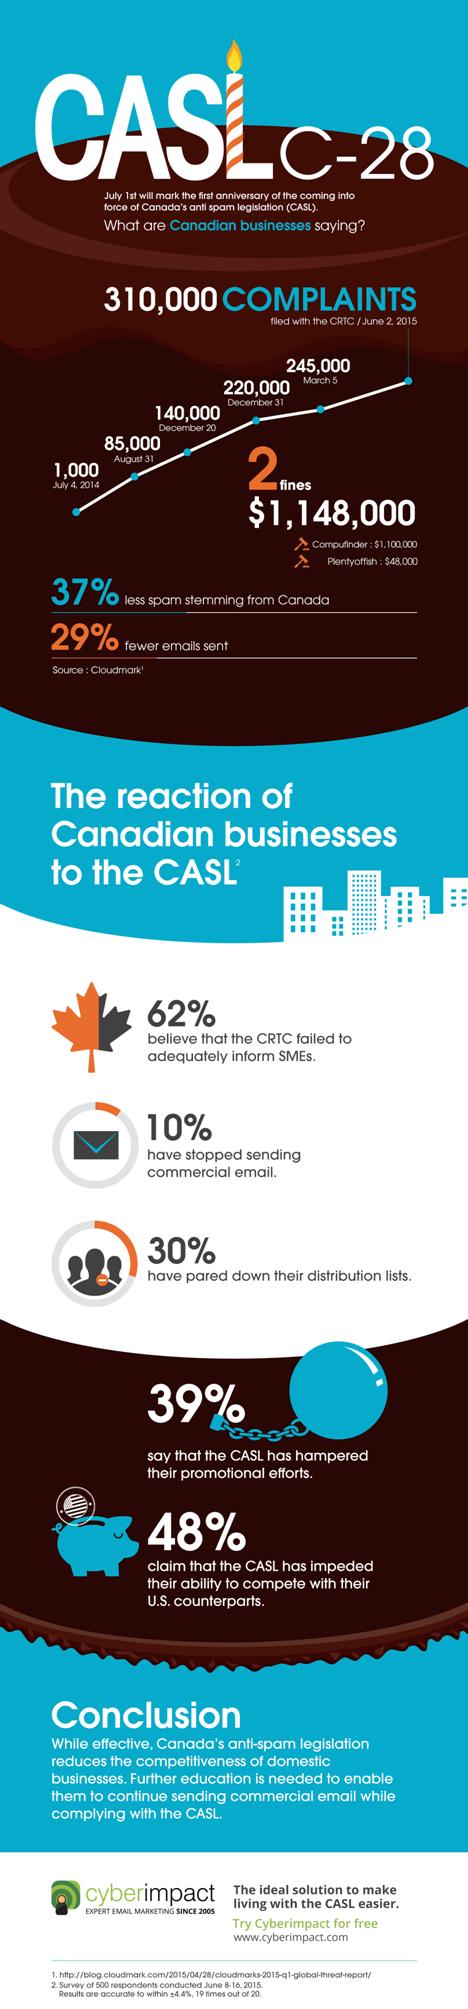 Cyberimpact CASL infographic